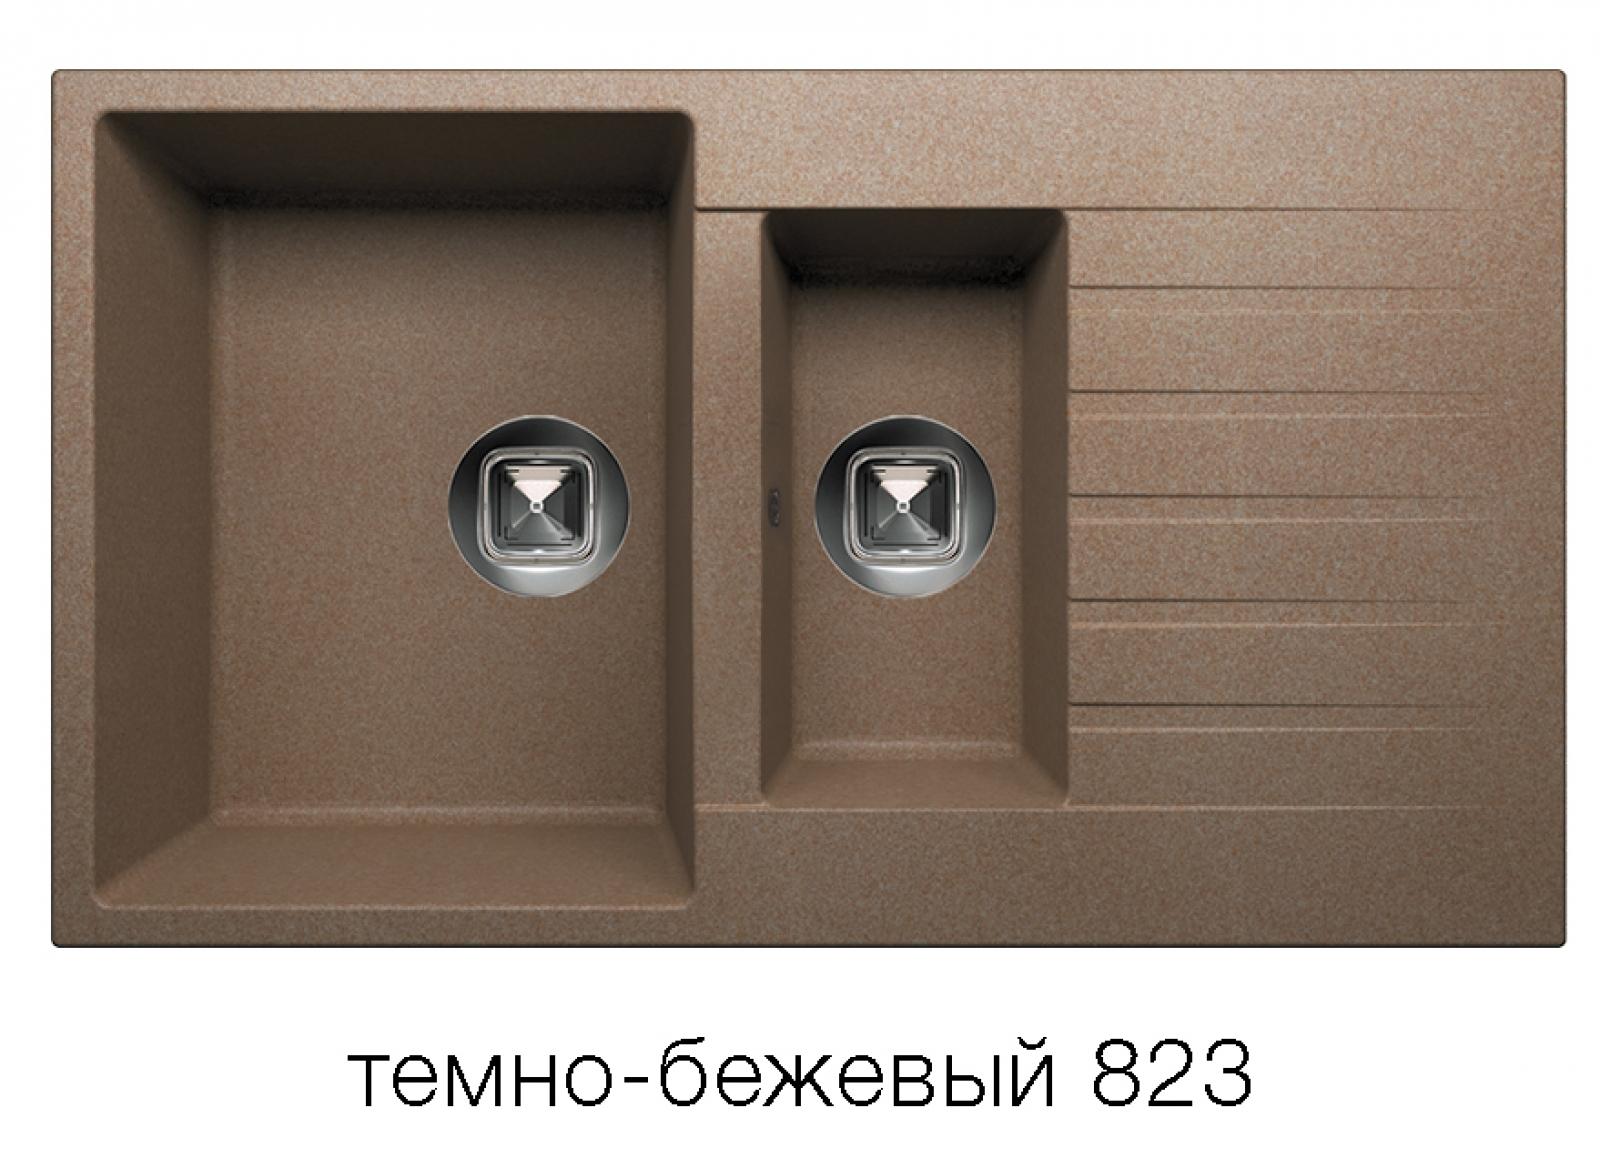 Мойка Tolero-R-118-823, цвет – темно-бежевый